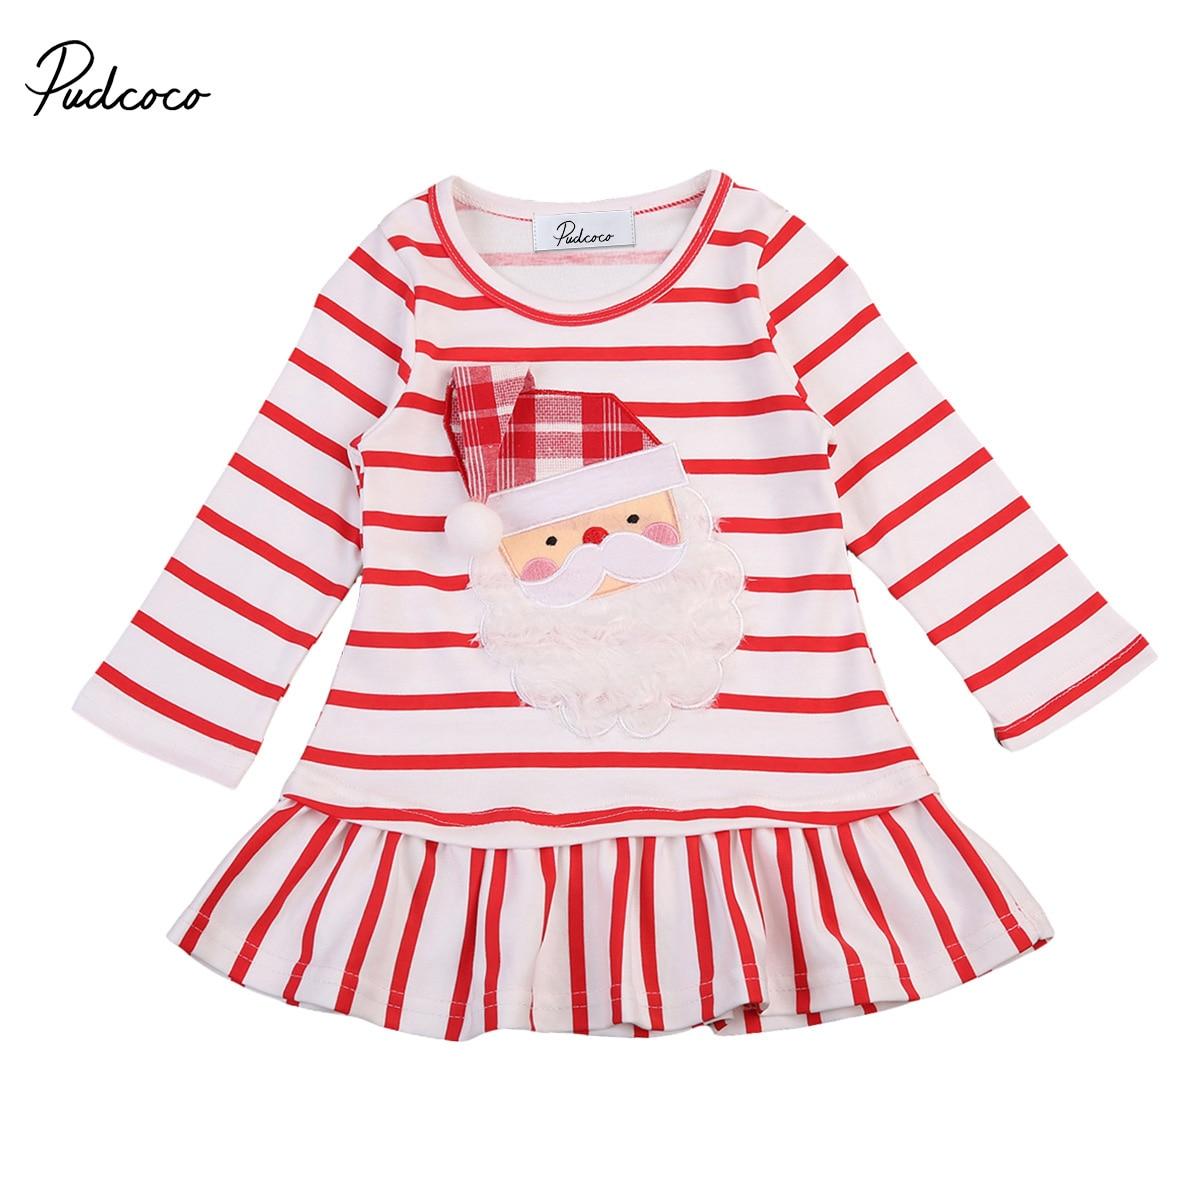 Toddler Newborn Baby Girls Dress Long Sleeve Mini Dress Cute Infant Striped Patchwork Clothes